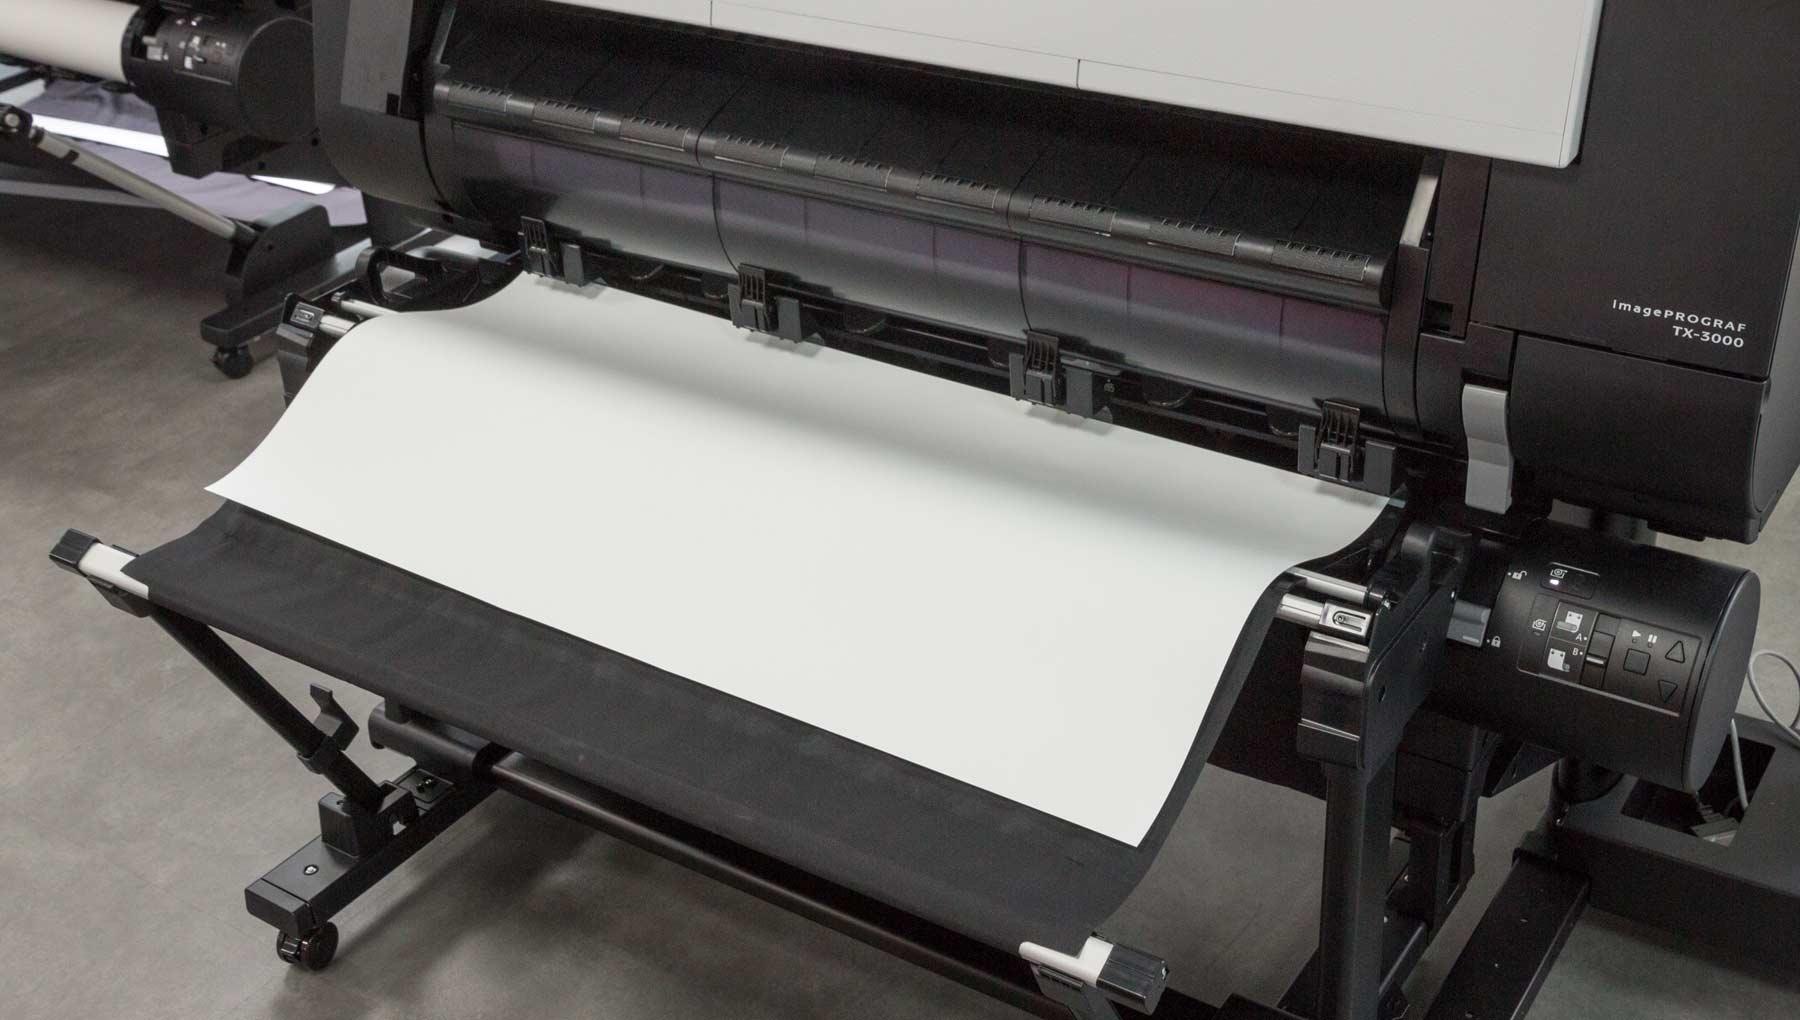 print catcher